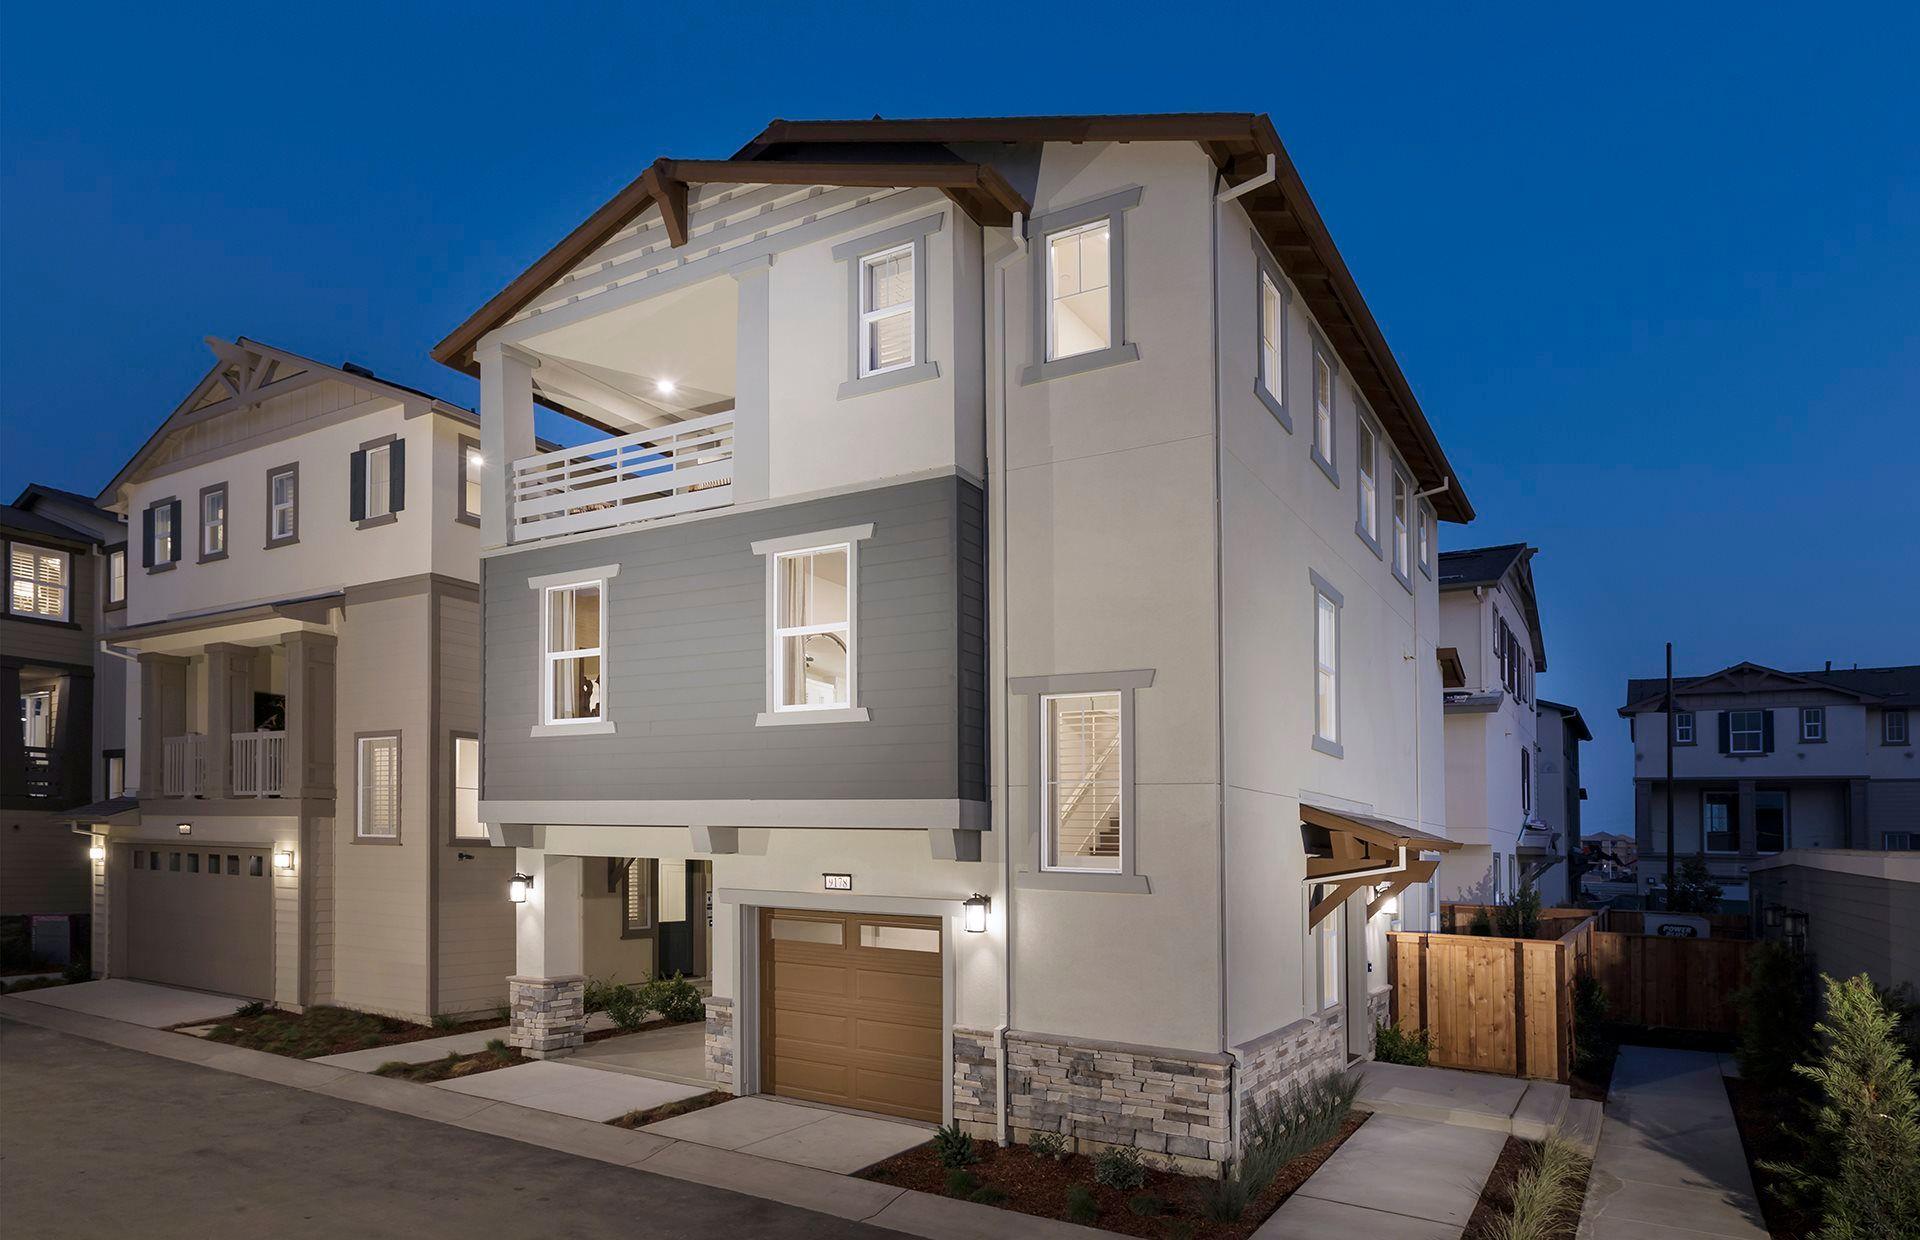 Villas at Bridgeway in Newark, Ca